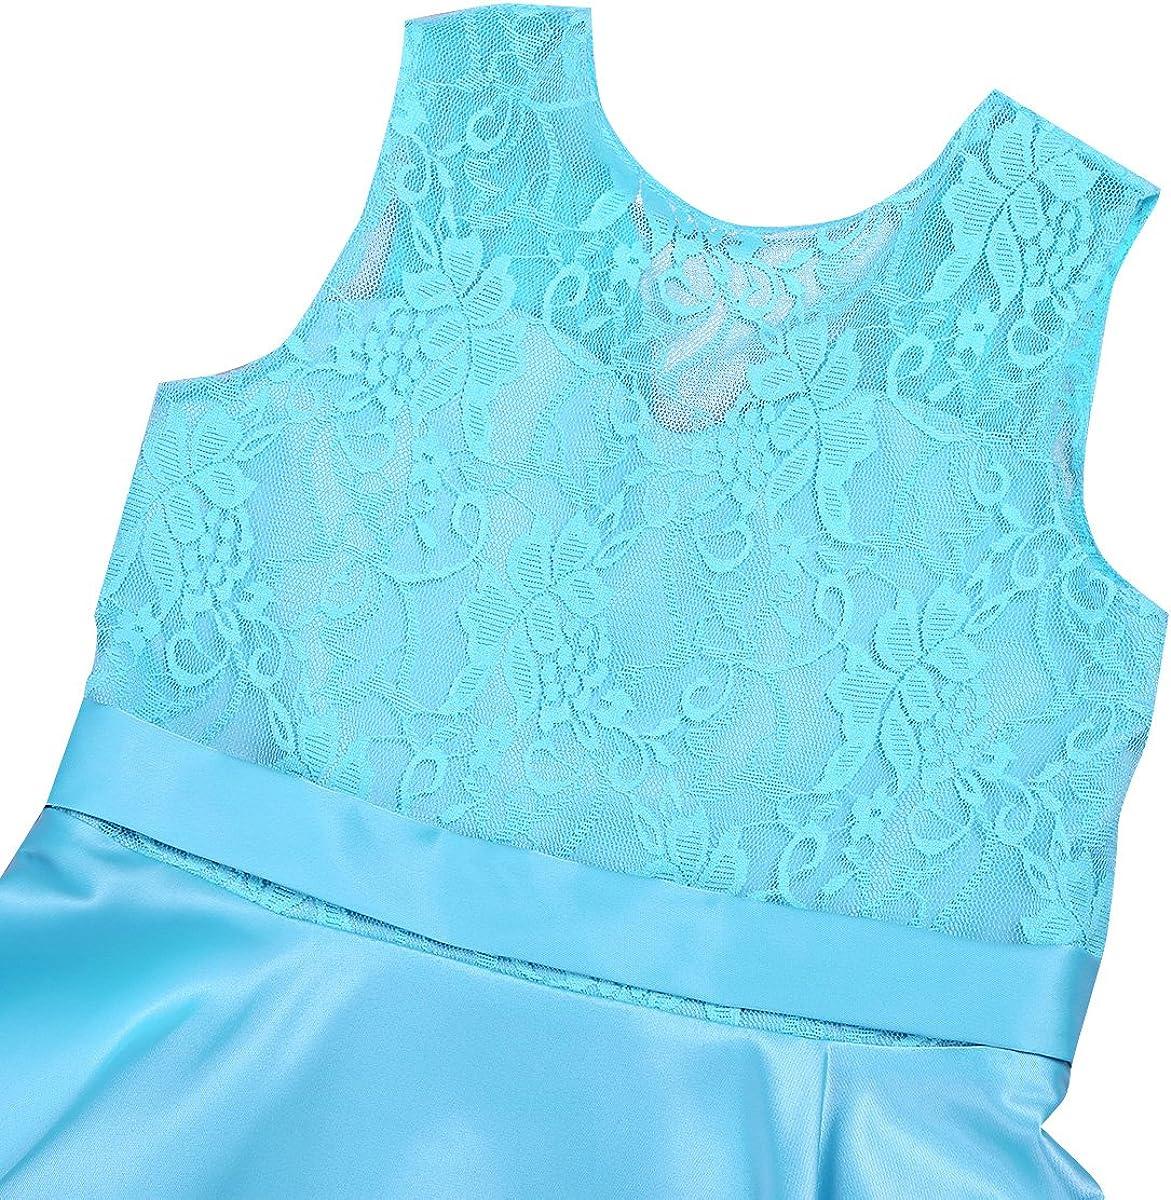 JEATHA Toddler High-Low Hem Flower Girl Dress V-Back Neckline Princess Wedding Bridesmaid Pageant Birthday Party Dresses